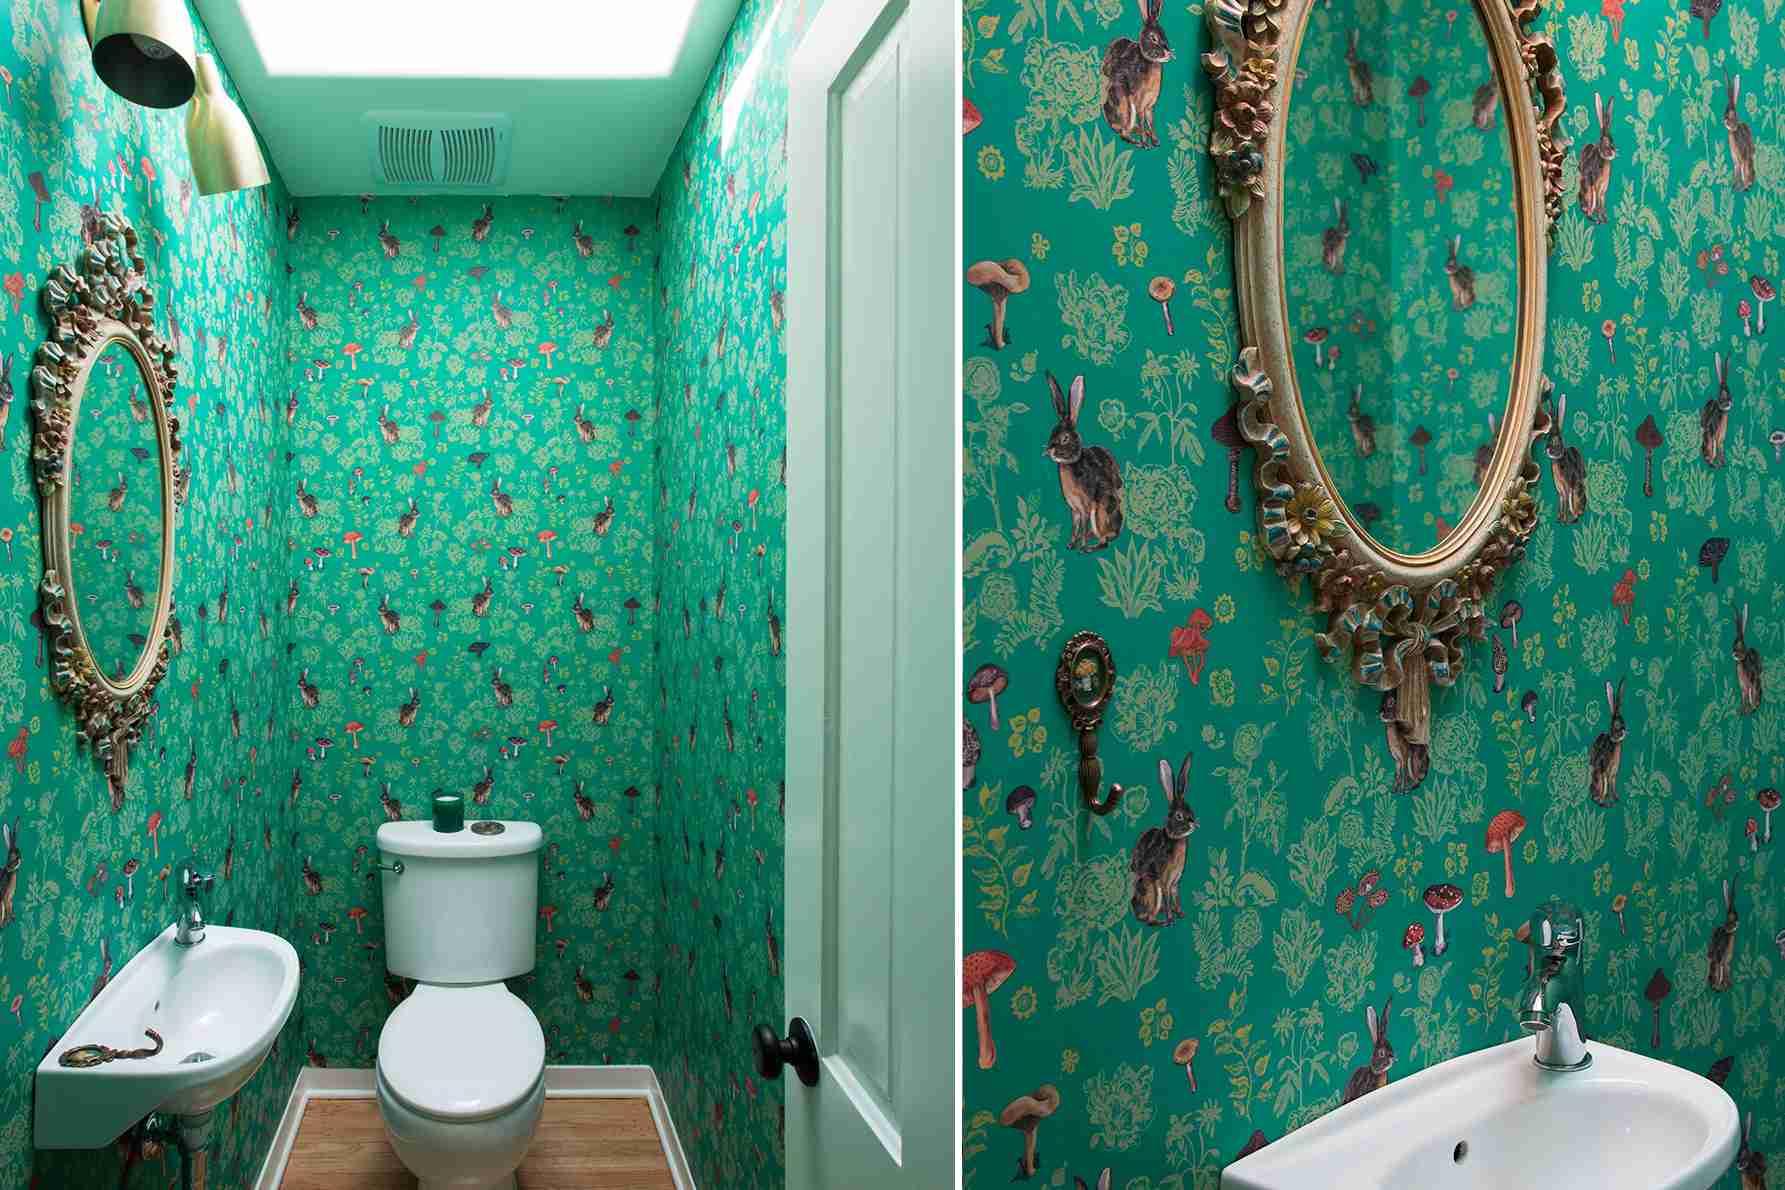 Green bathroom with bunny wallpaper